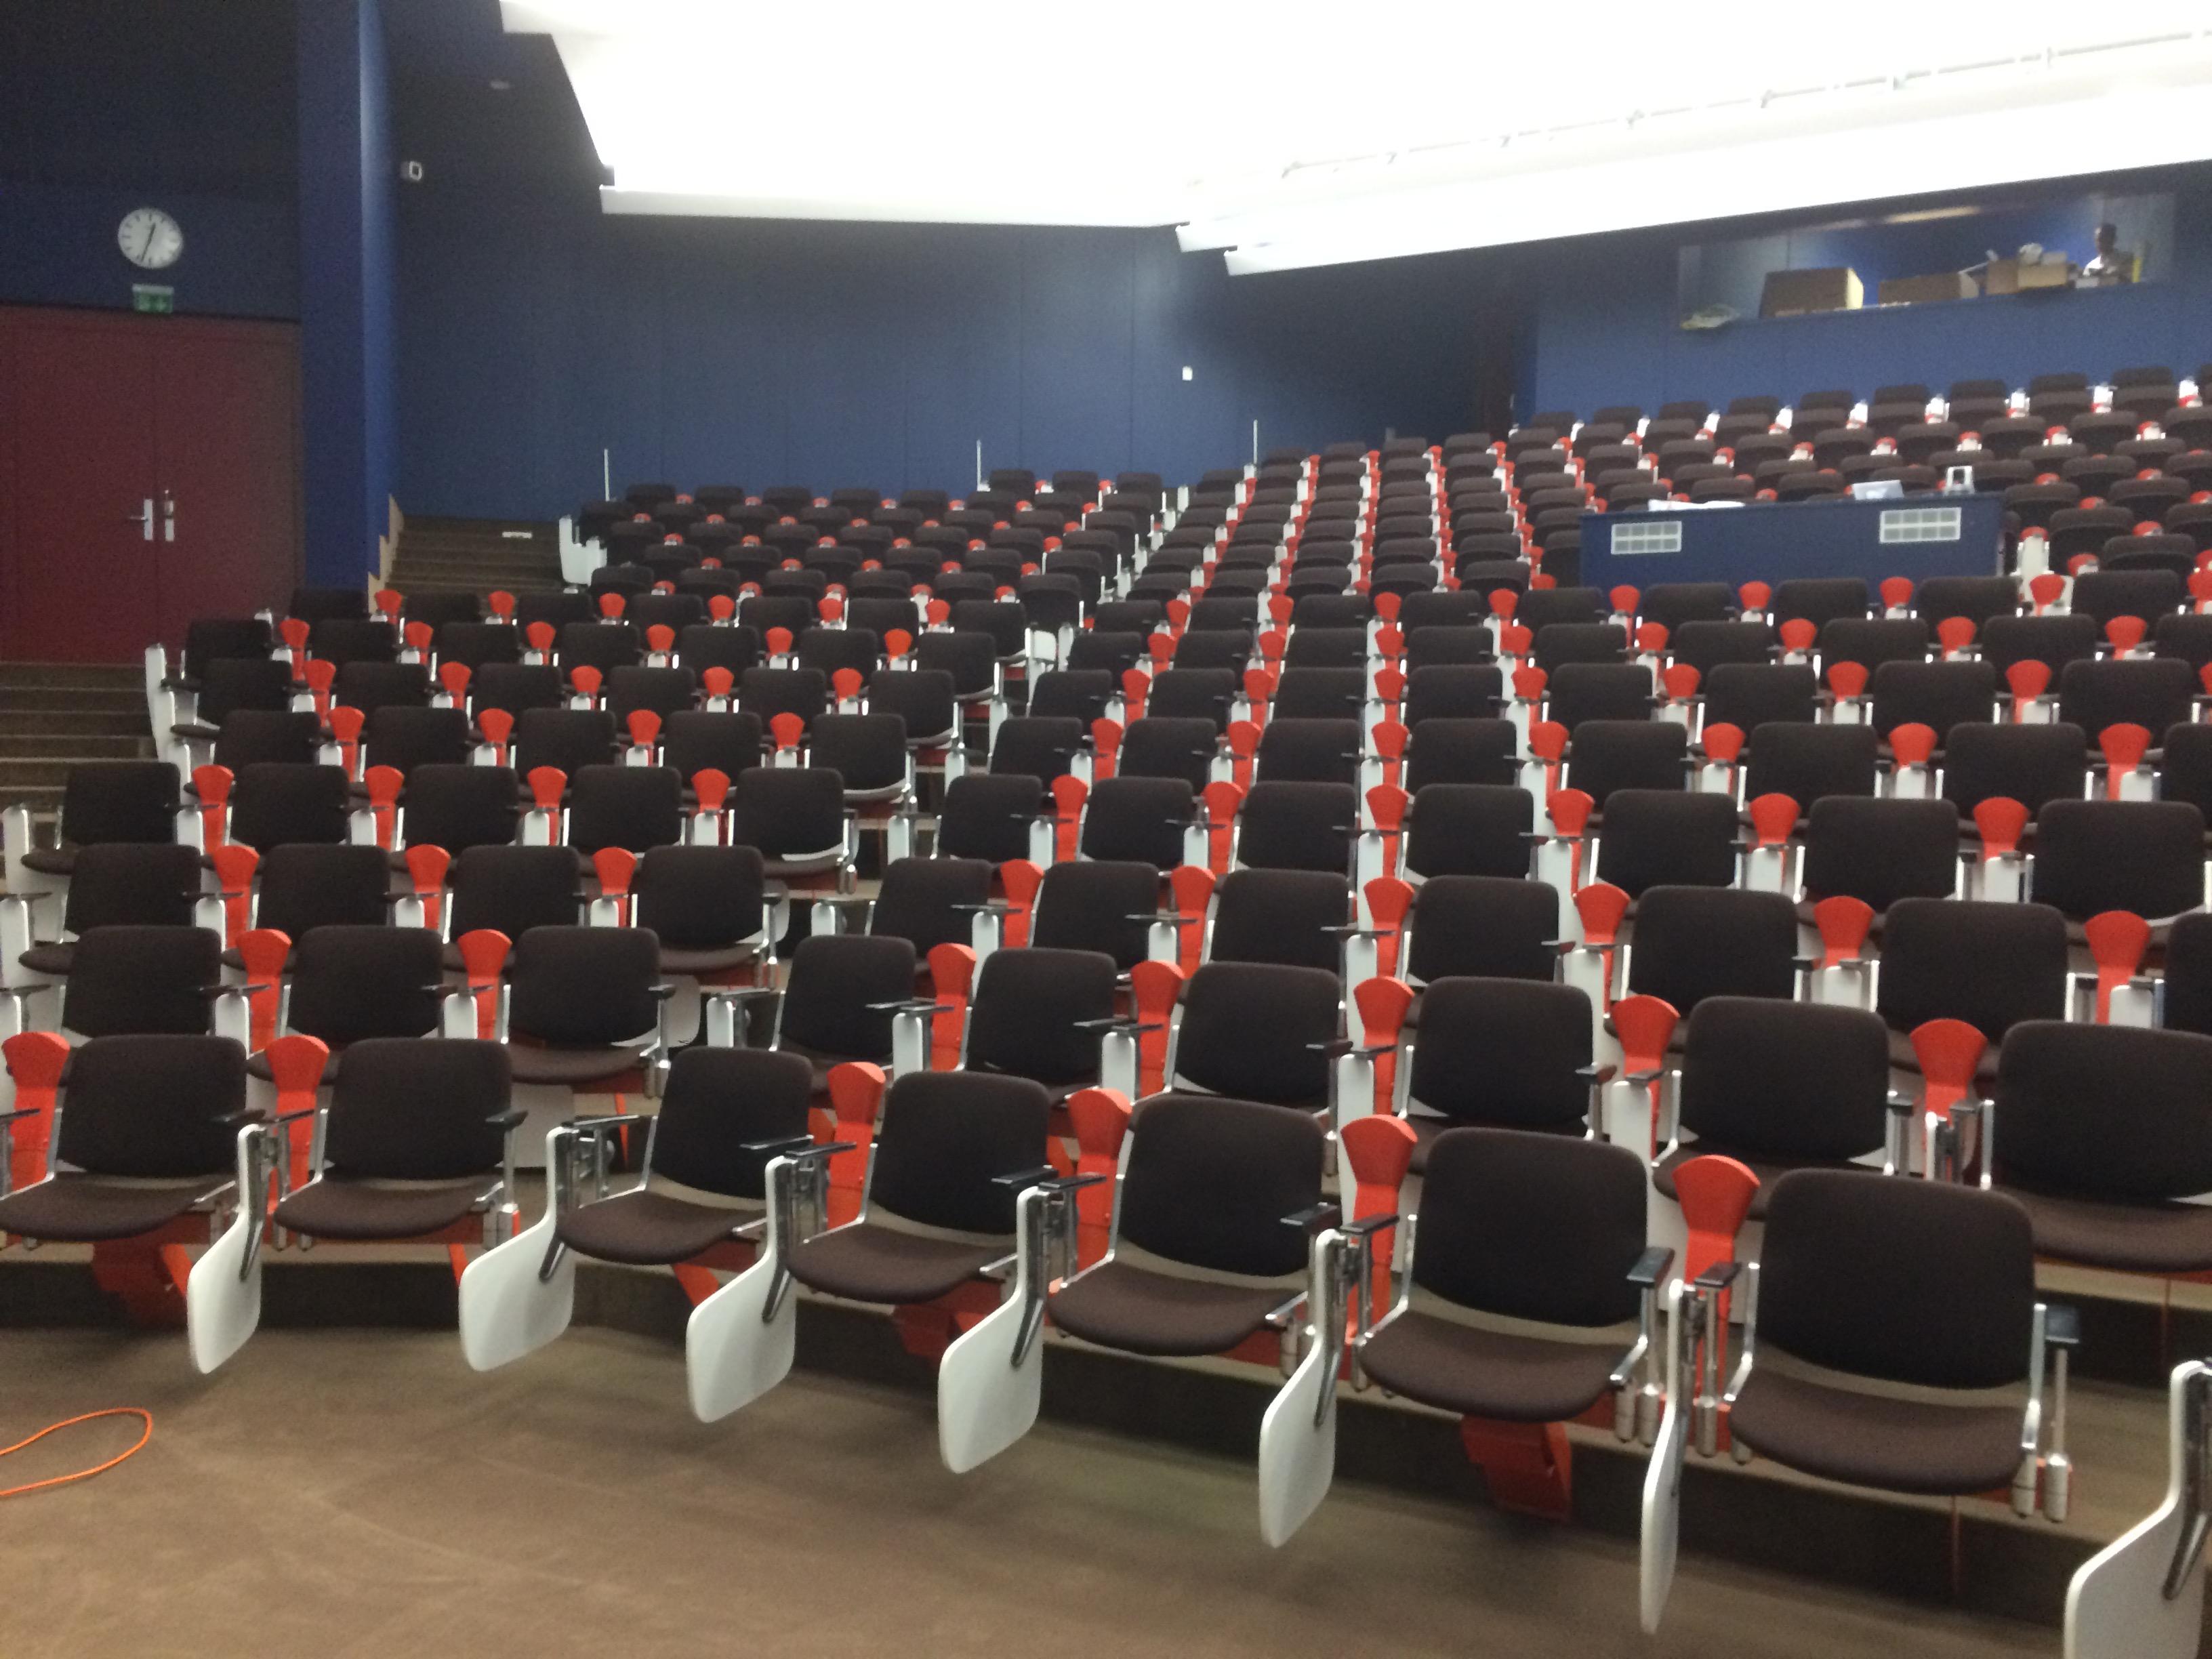 HUCKA Reinigung Stühle mit Gestell MPI Hörsaal (2)